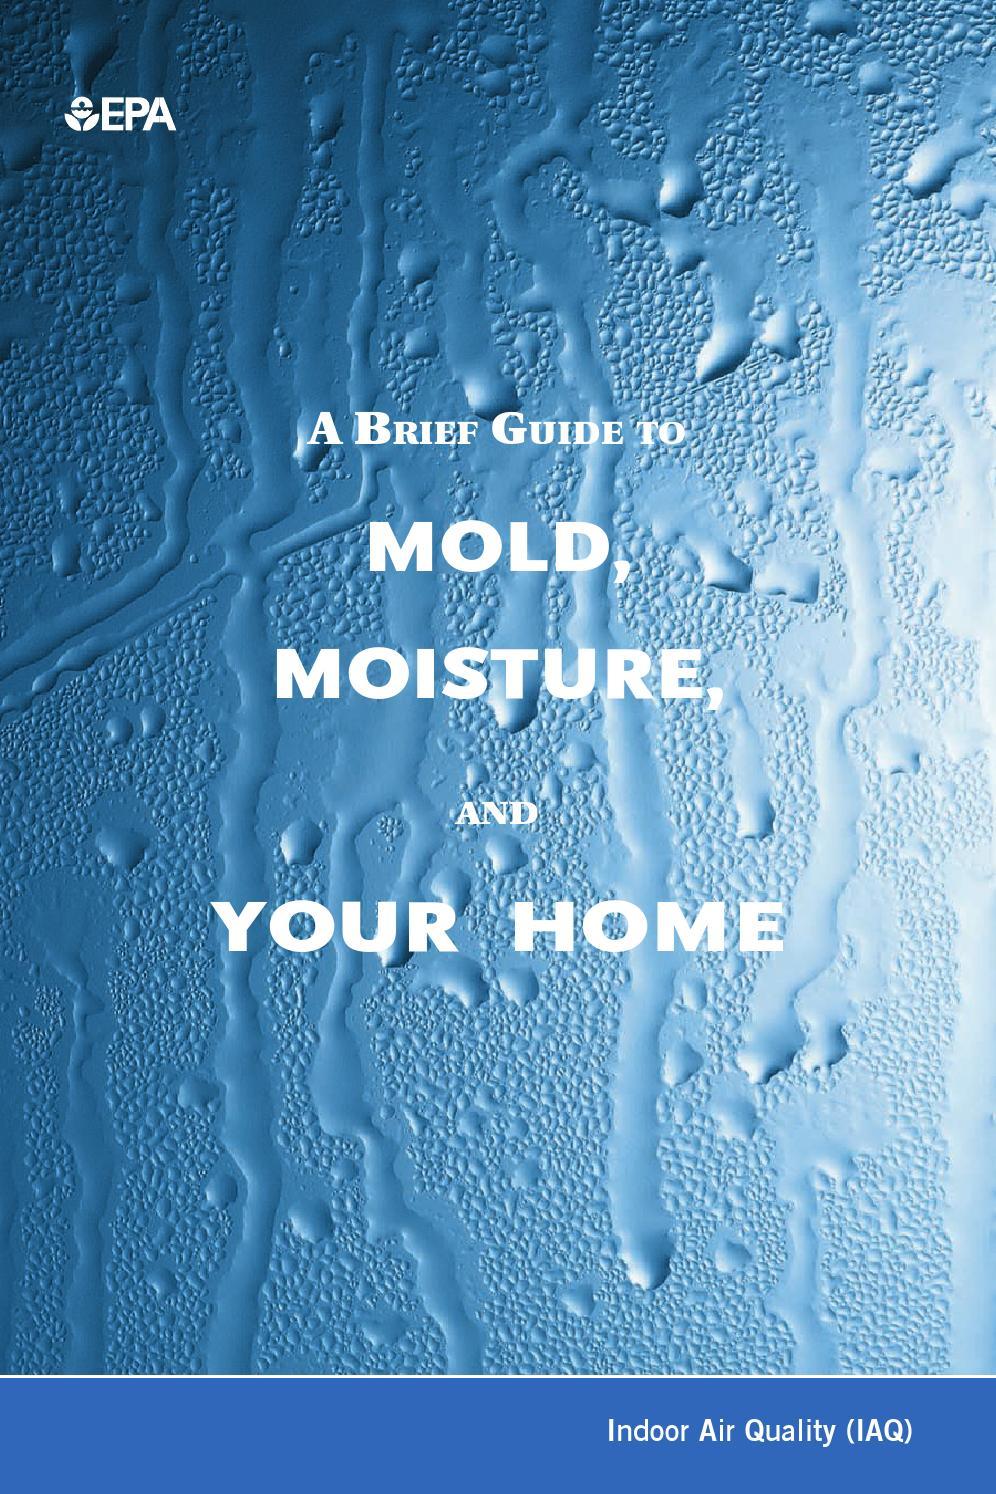 Epa Mold Amp Moisture Brochure By Kelly Dodson Issuu